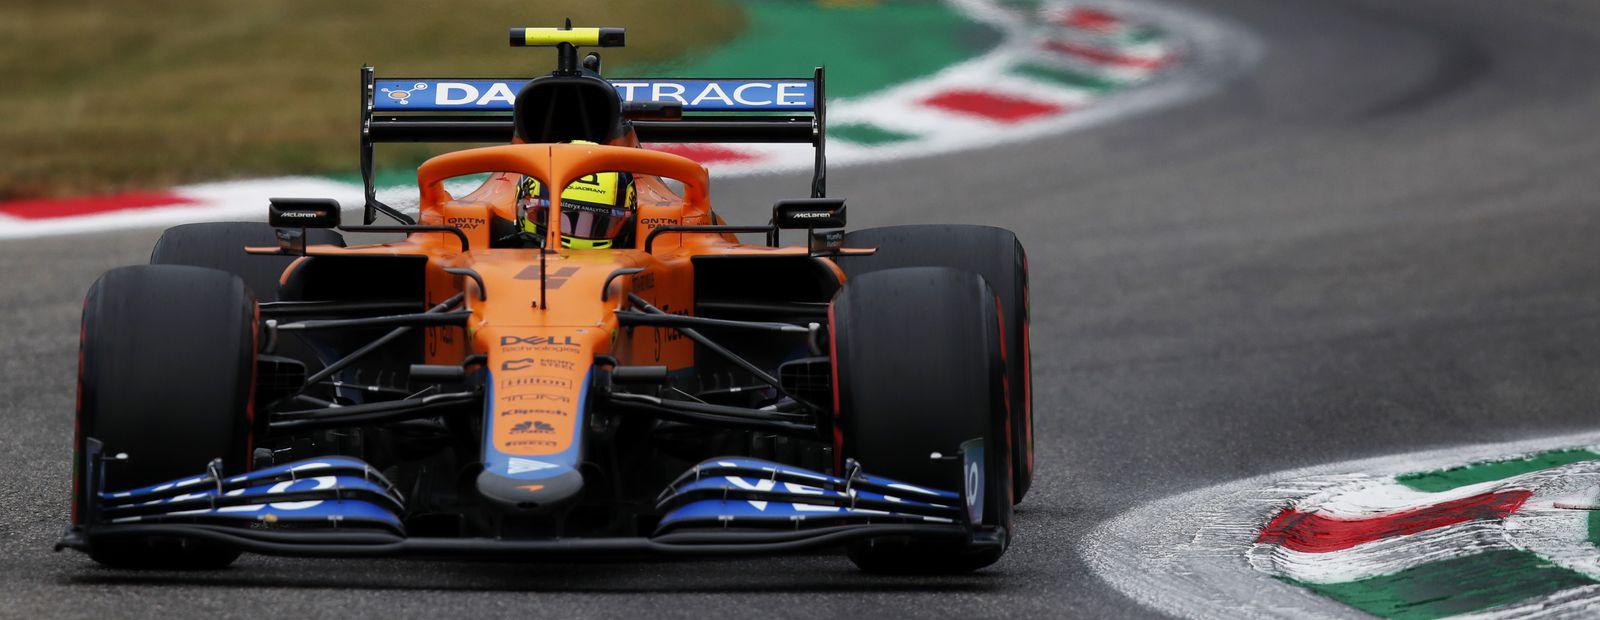 Grand Prix d'Italie 2021 – Qualifications du vendredi